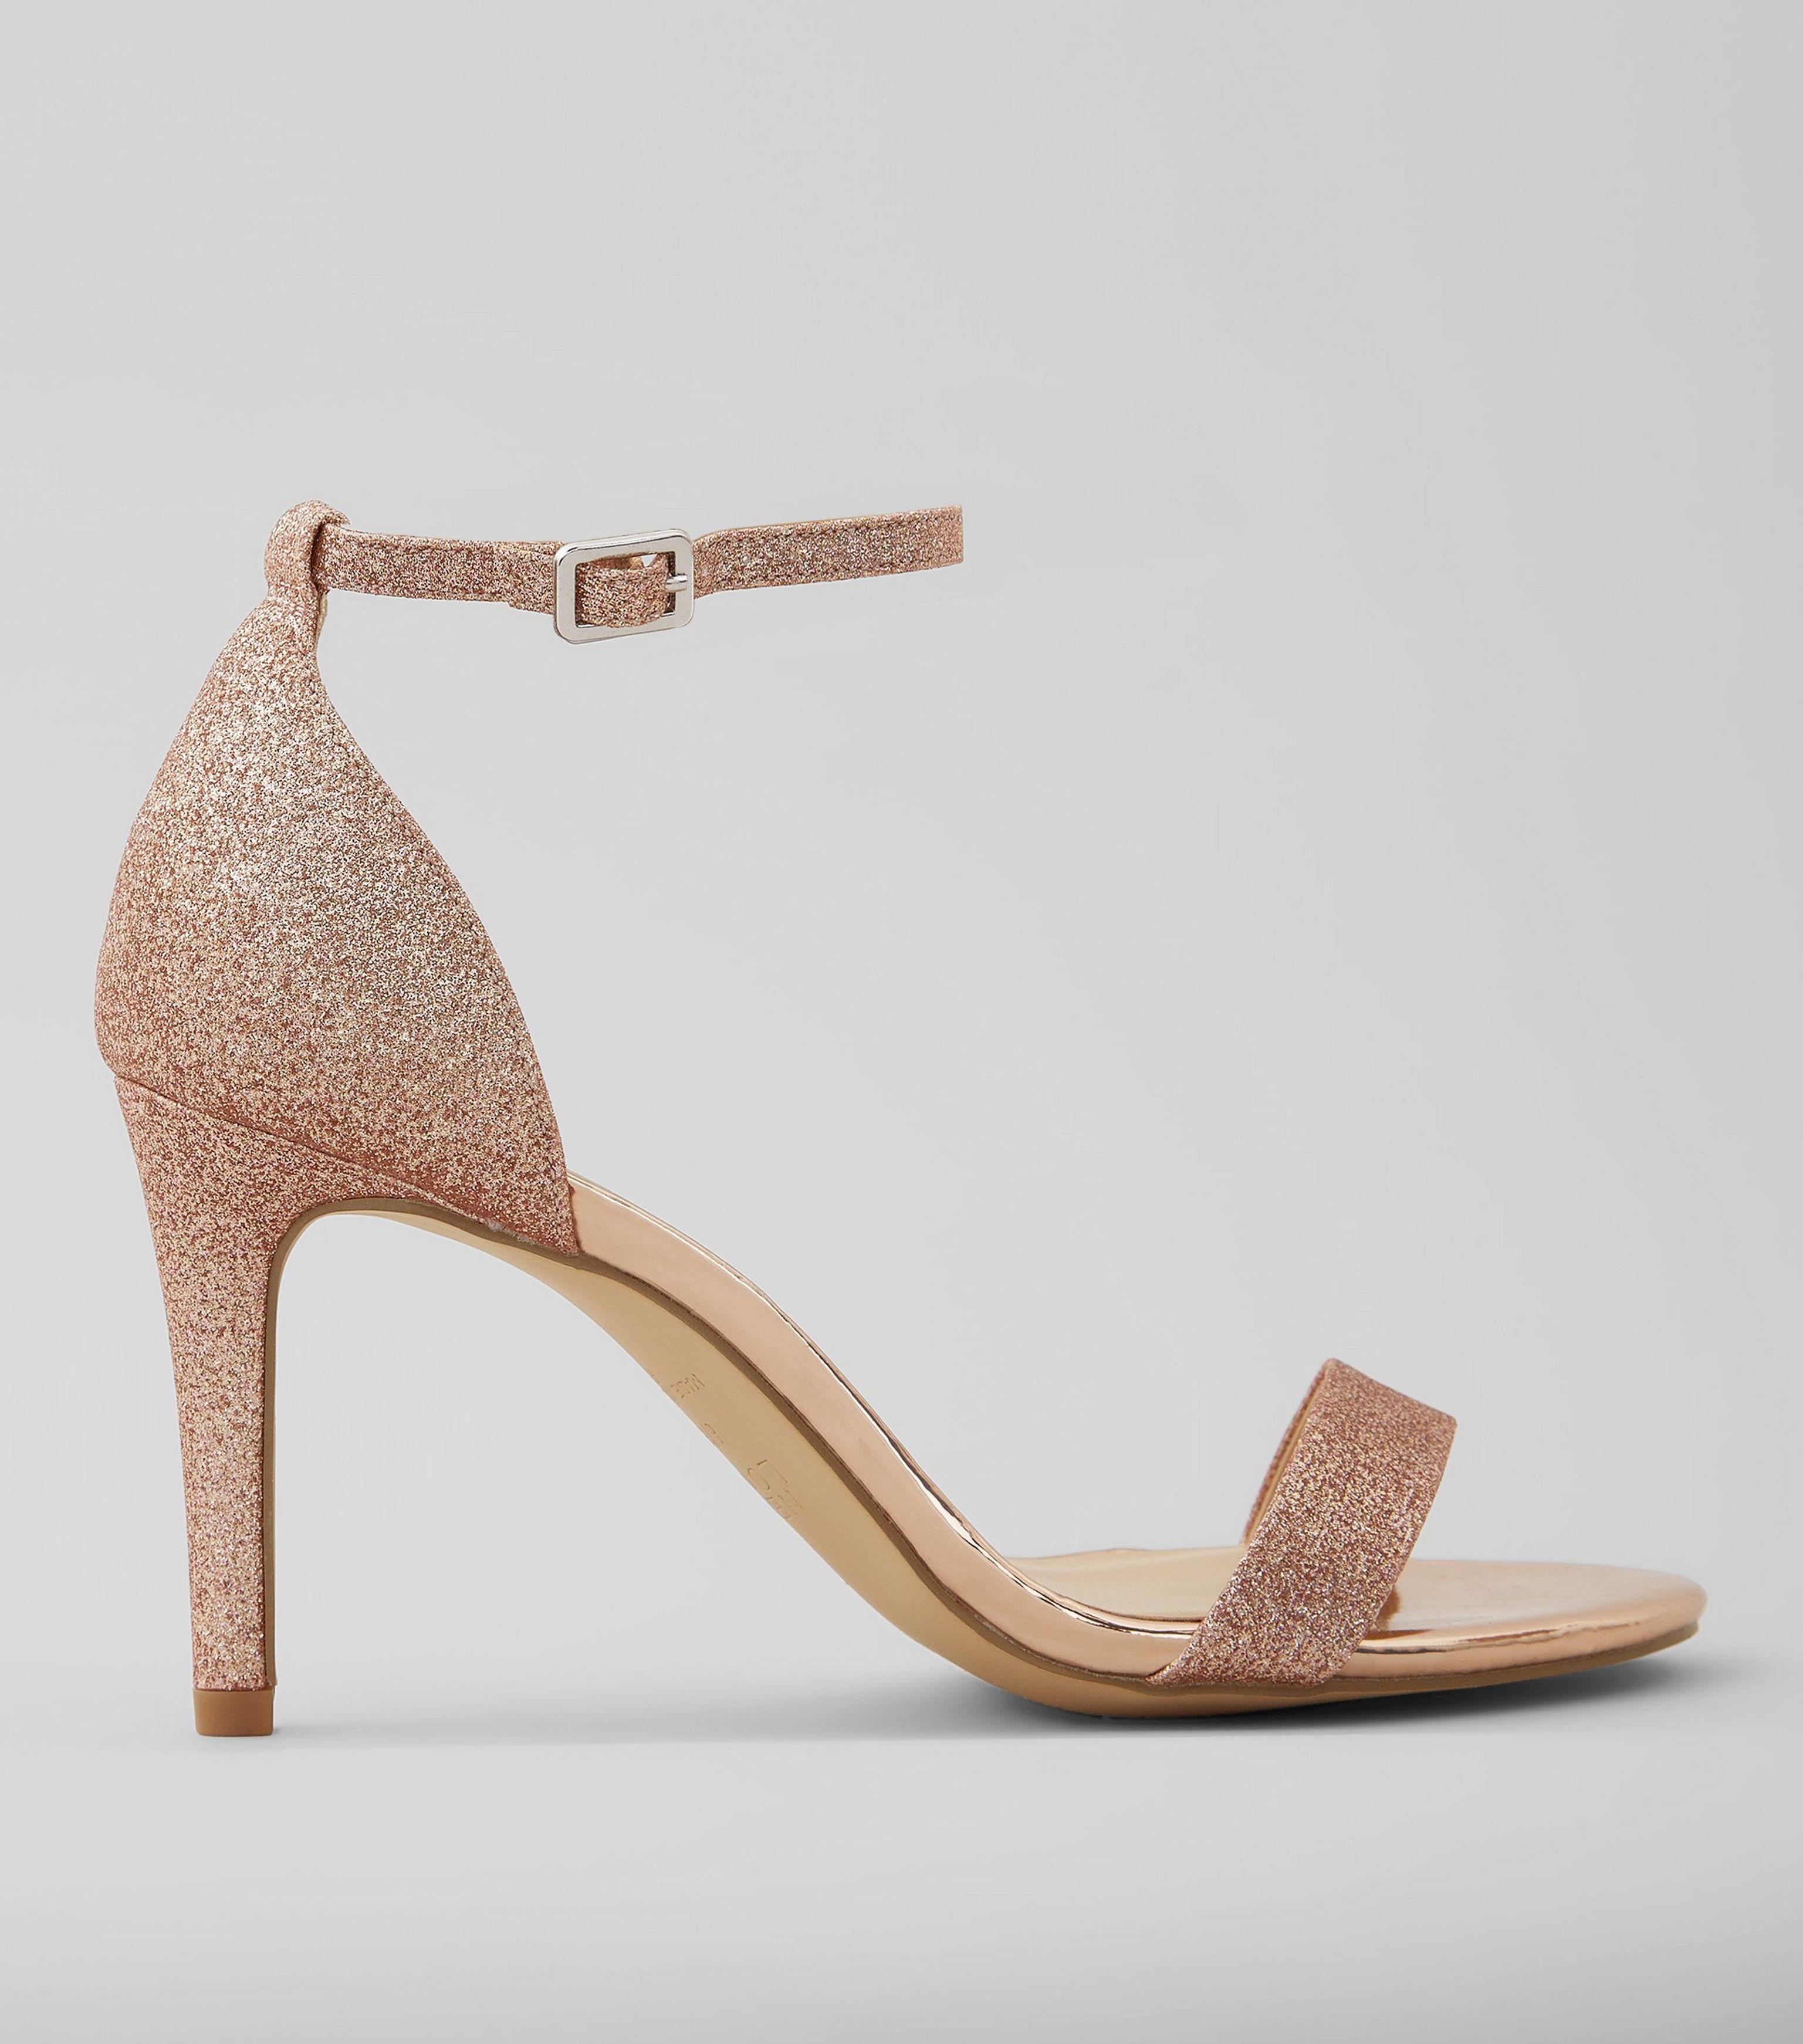 a58da82ddbfd New Look Wide Fit Rose Gold Glitter Heeled Sandals - Lyst